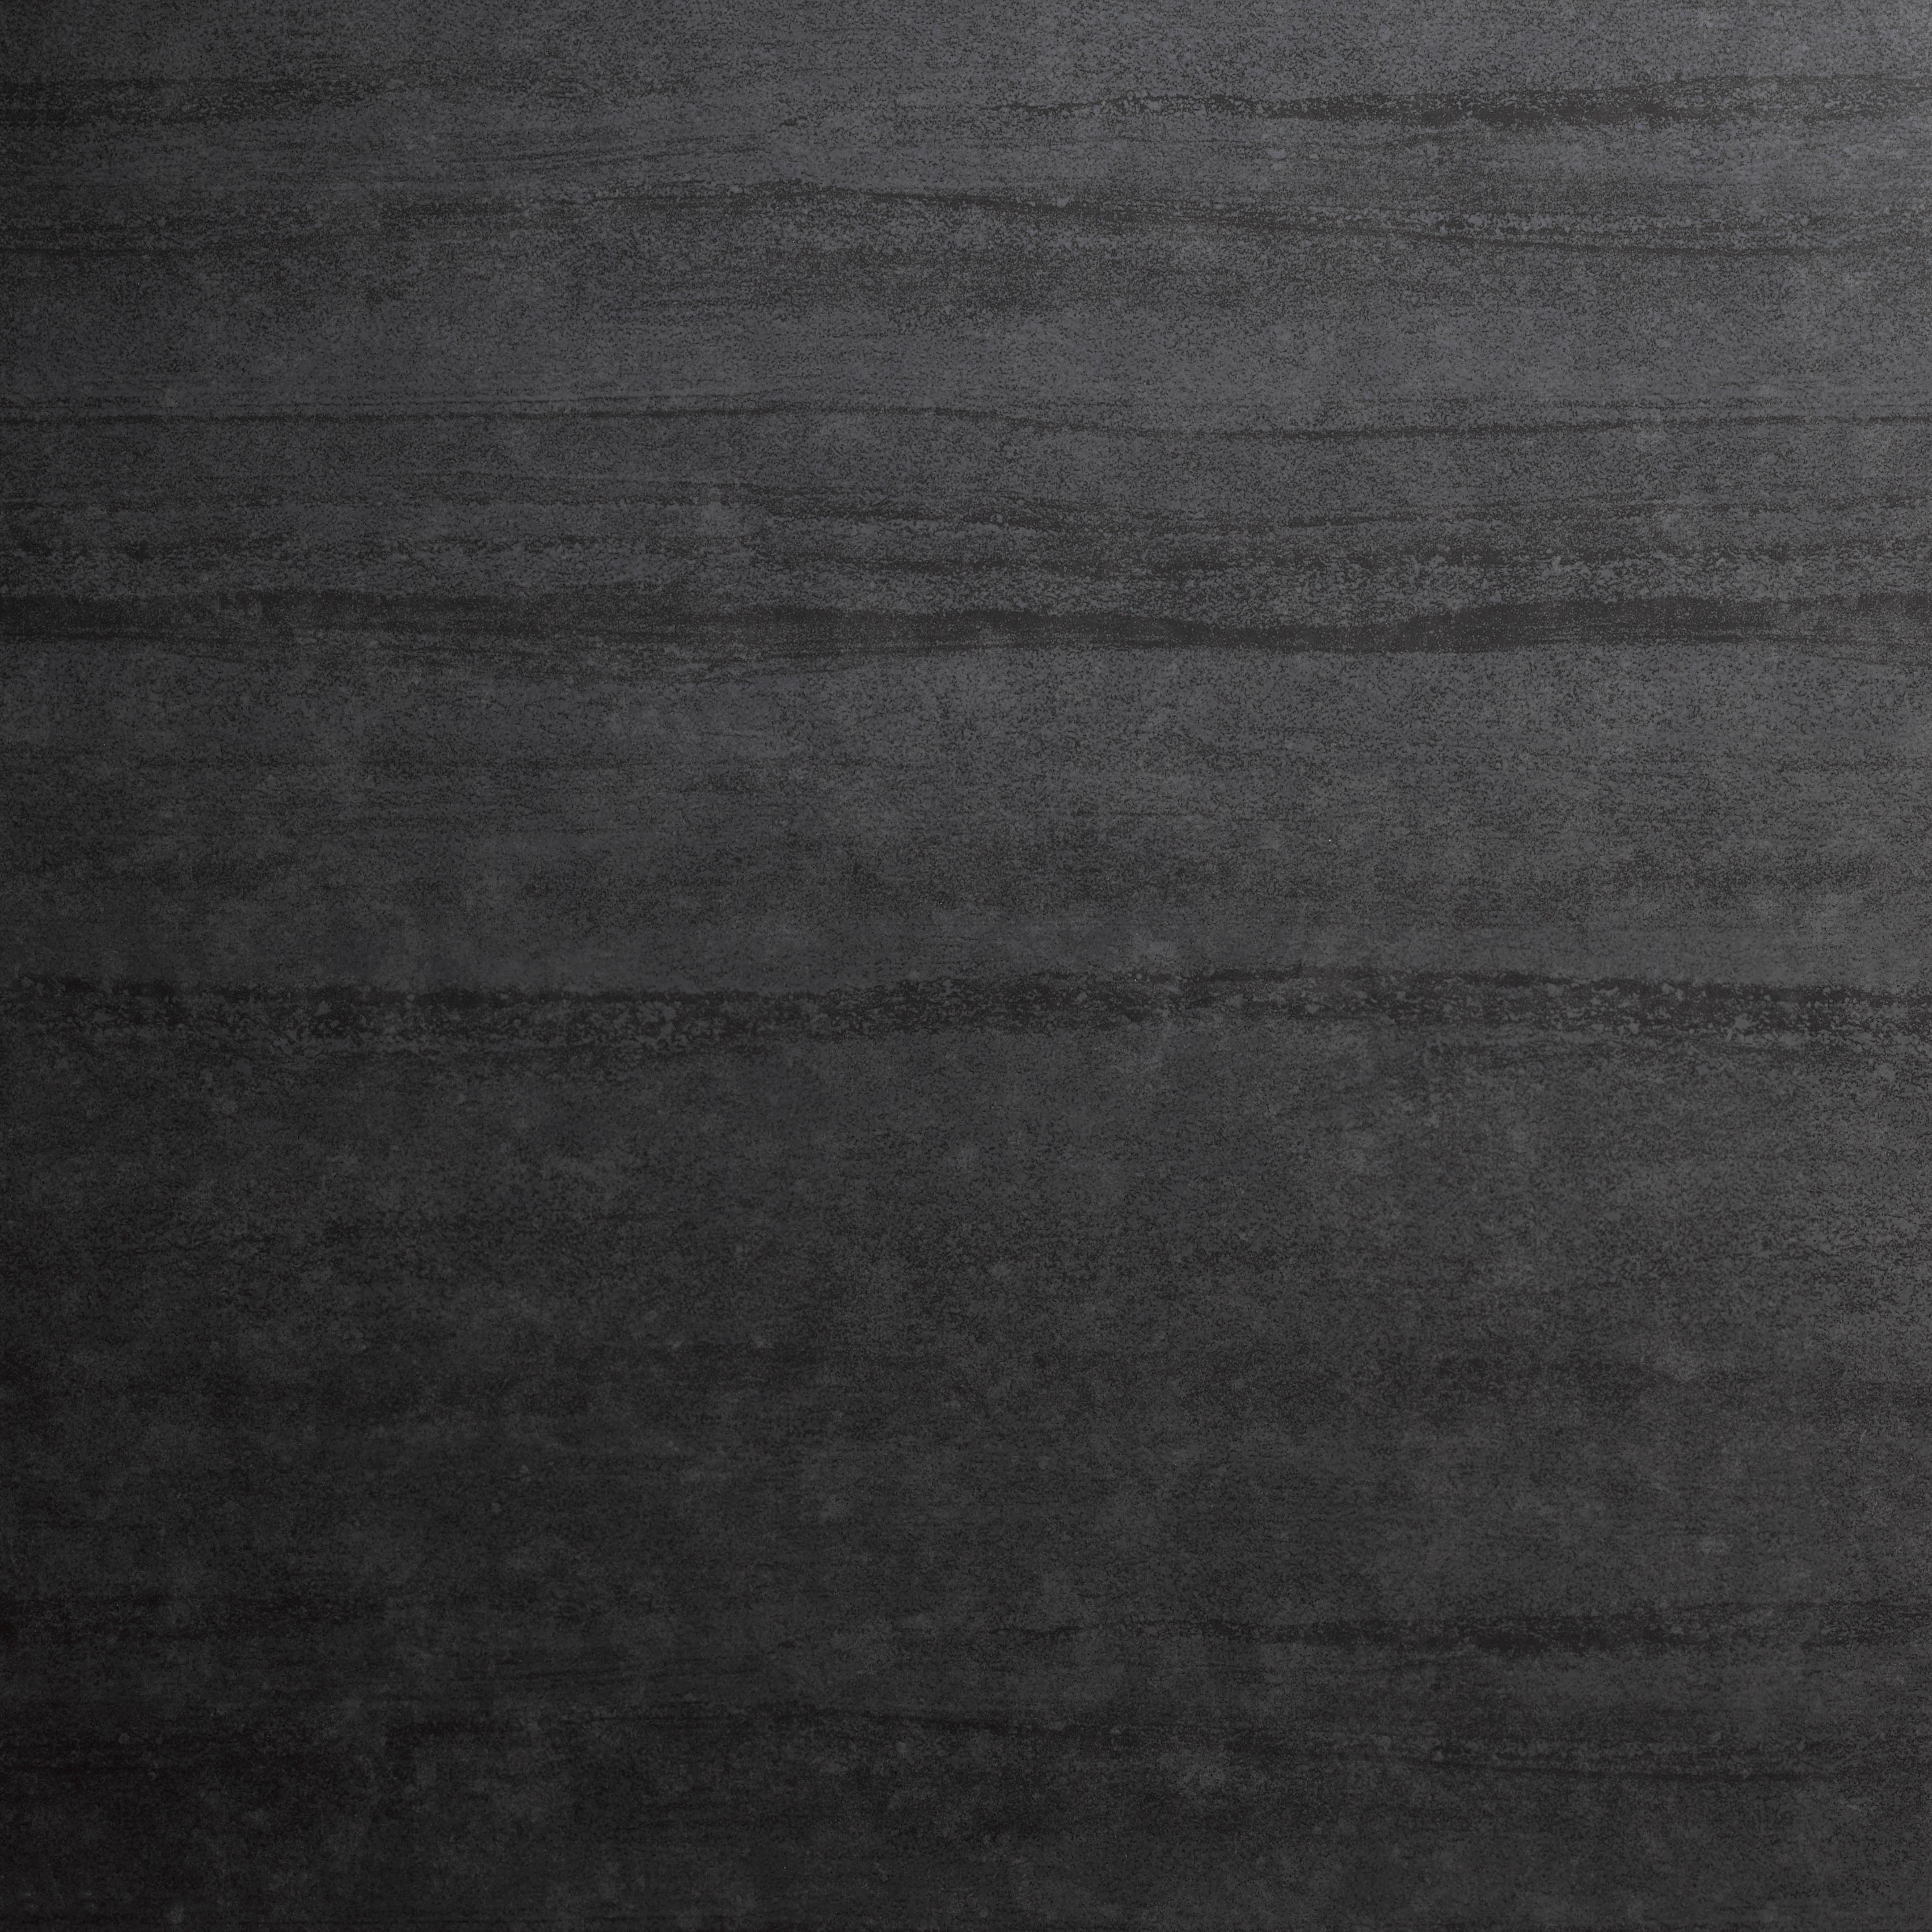 Blackened-Aluminum